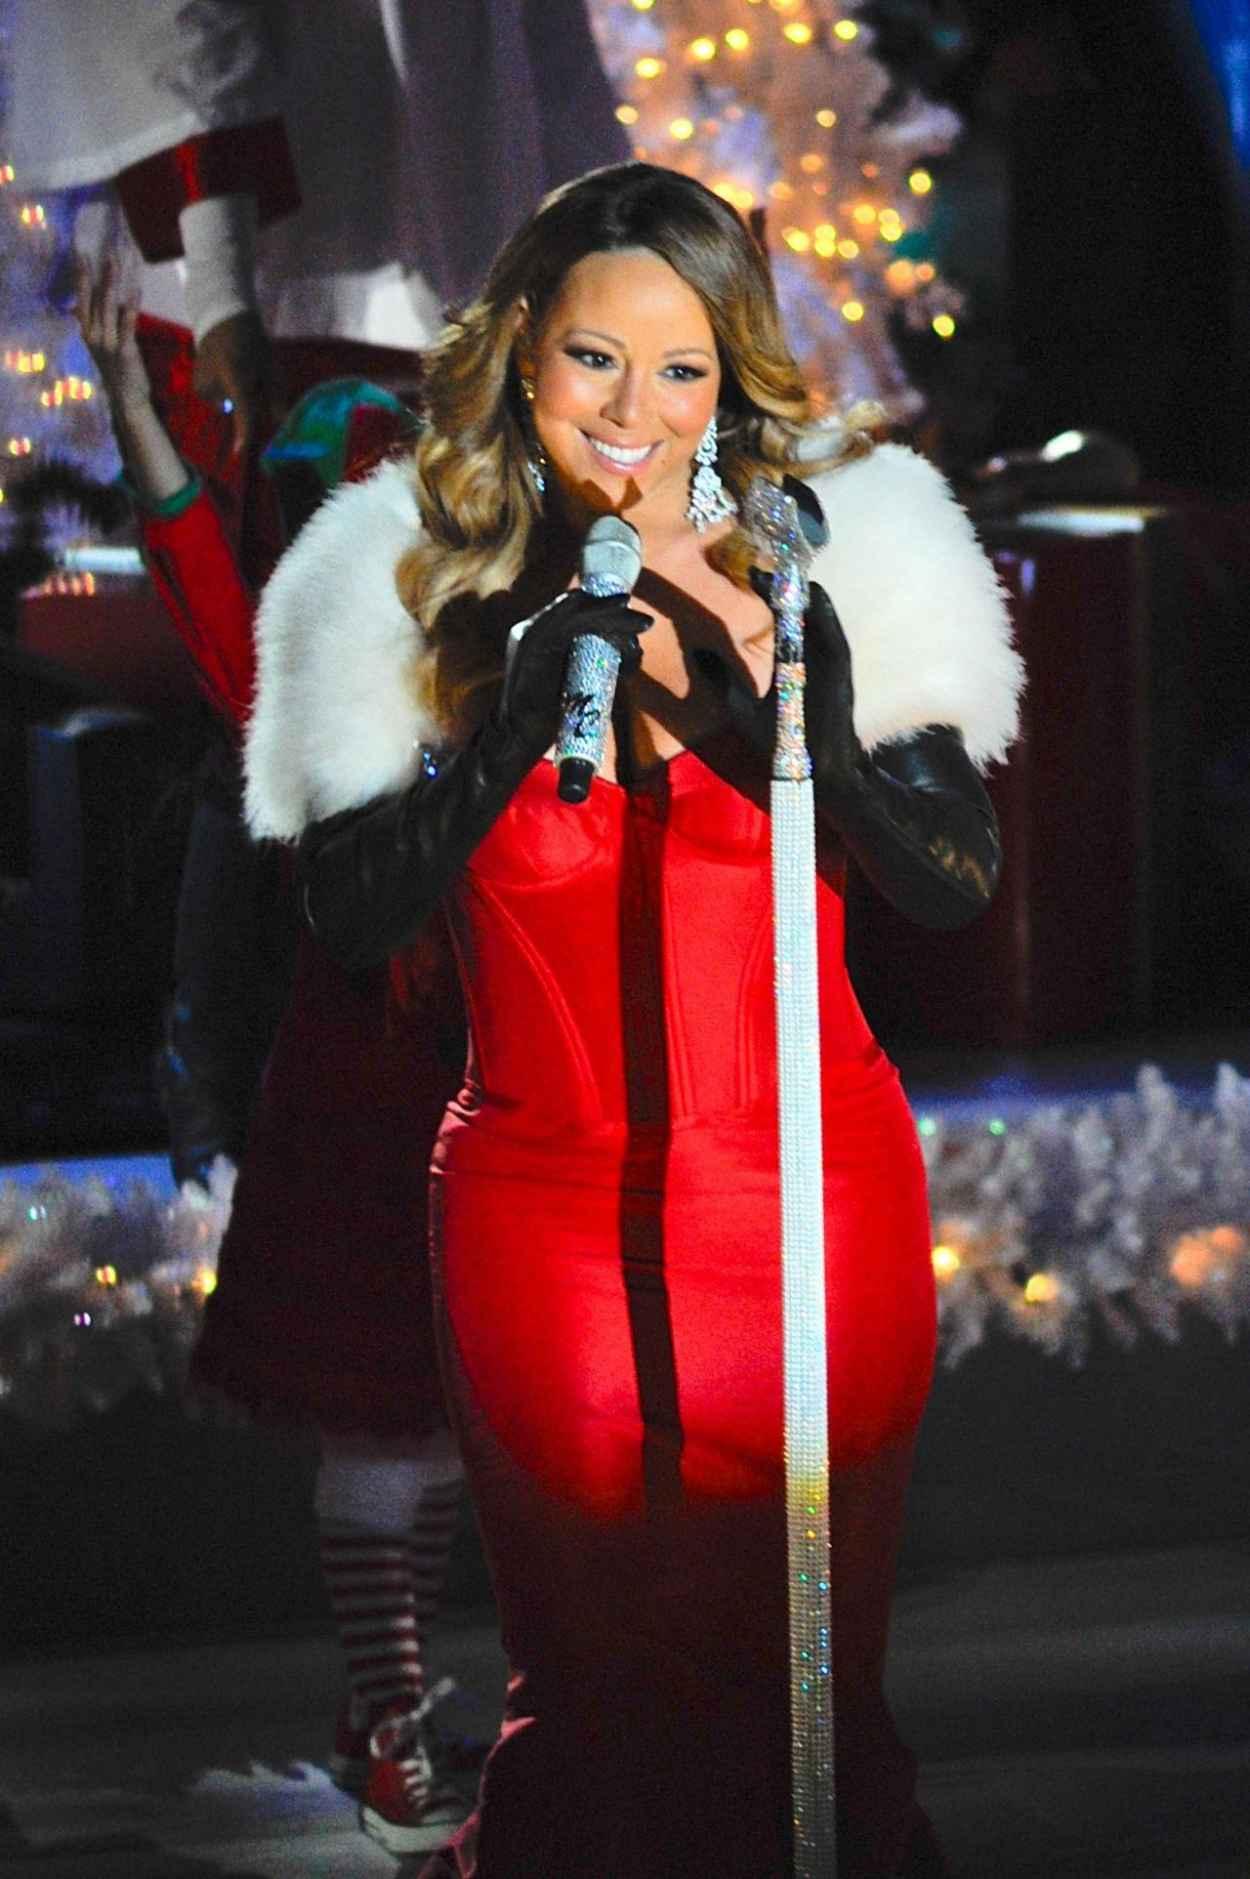 Mariah Carey Performs at 81st Annual Rockefeller Center Christmas Tree Lighting - Dec. 2015-1